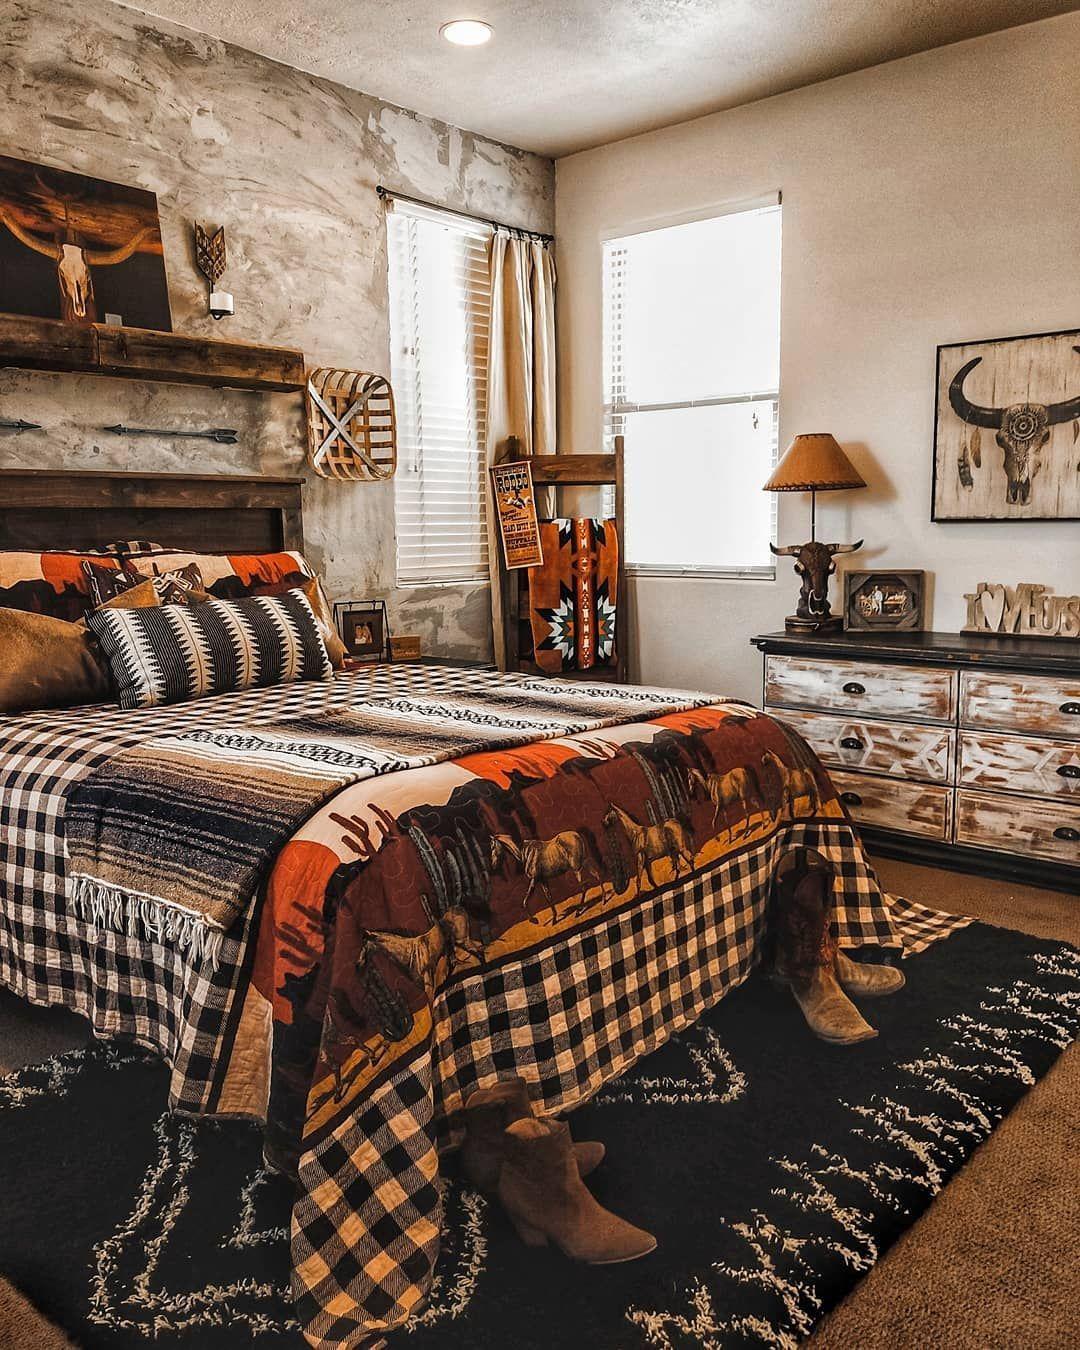 Home Decor Minimalist In 2020 Western Bedroom Decor Western Bedroom Western Living Rooms